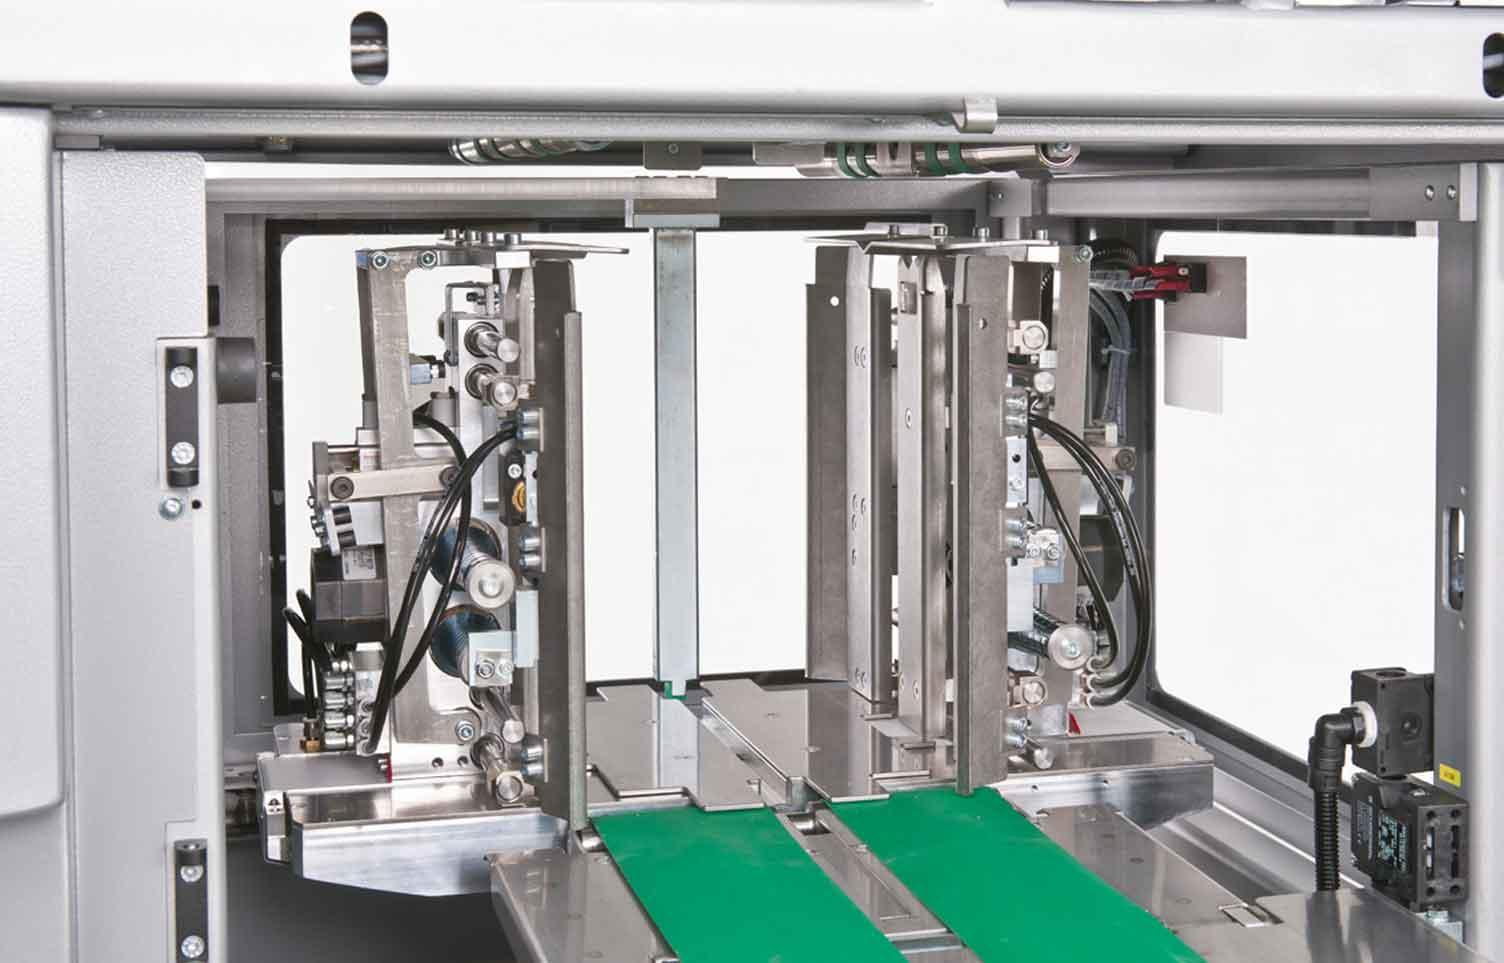 KL 540 Liftpackkreuzleger elektrische Drehkorbverstellung Gaemmerler